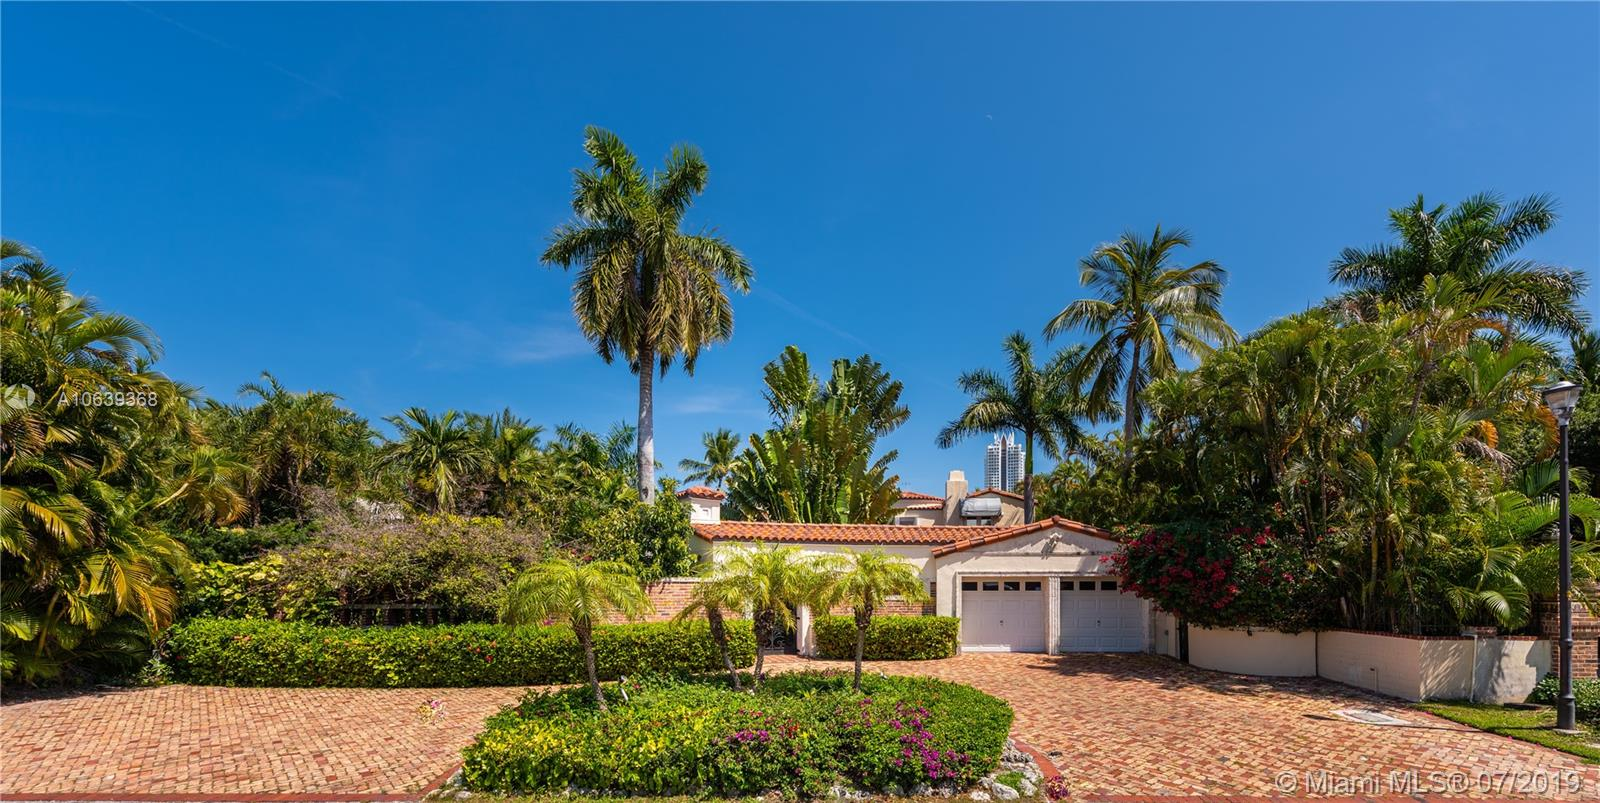 6417 Pine Tree Drive Cir, Miami Beach, FL 33141